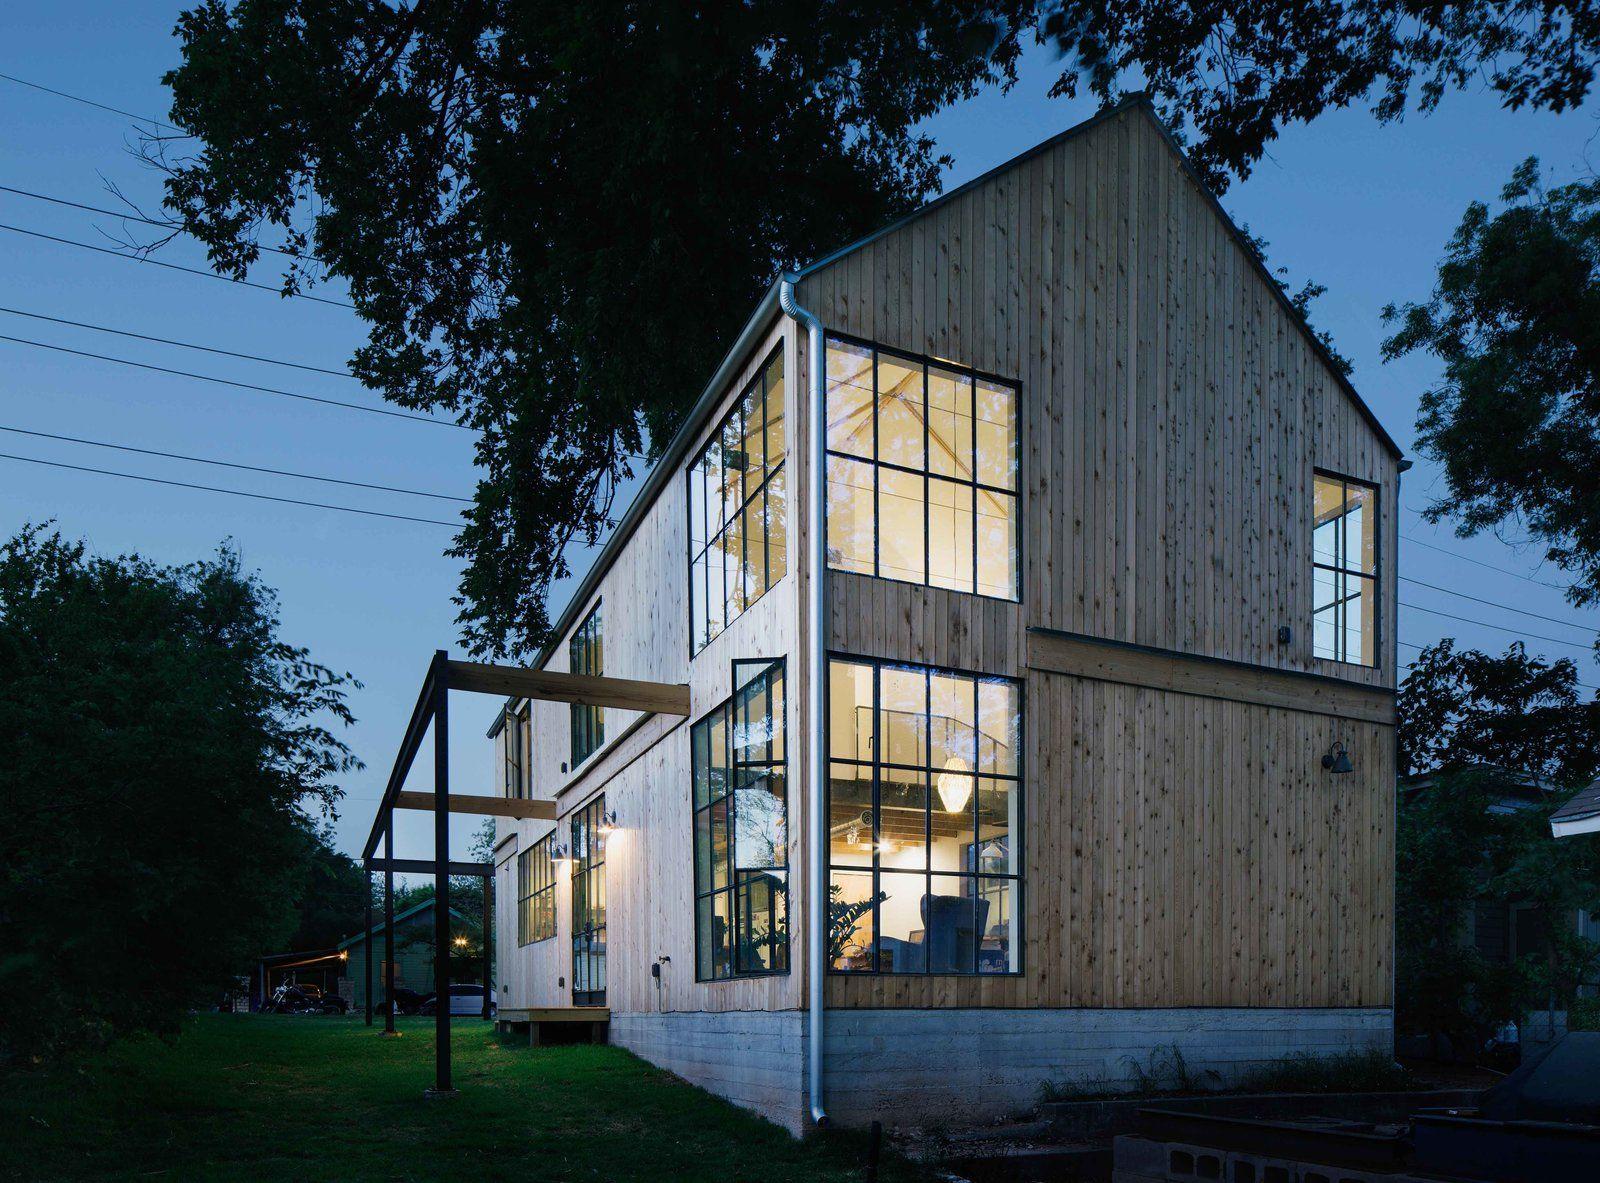 Shane Michael Pavonetti Austin-based Architect And